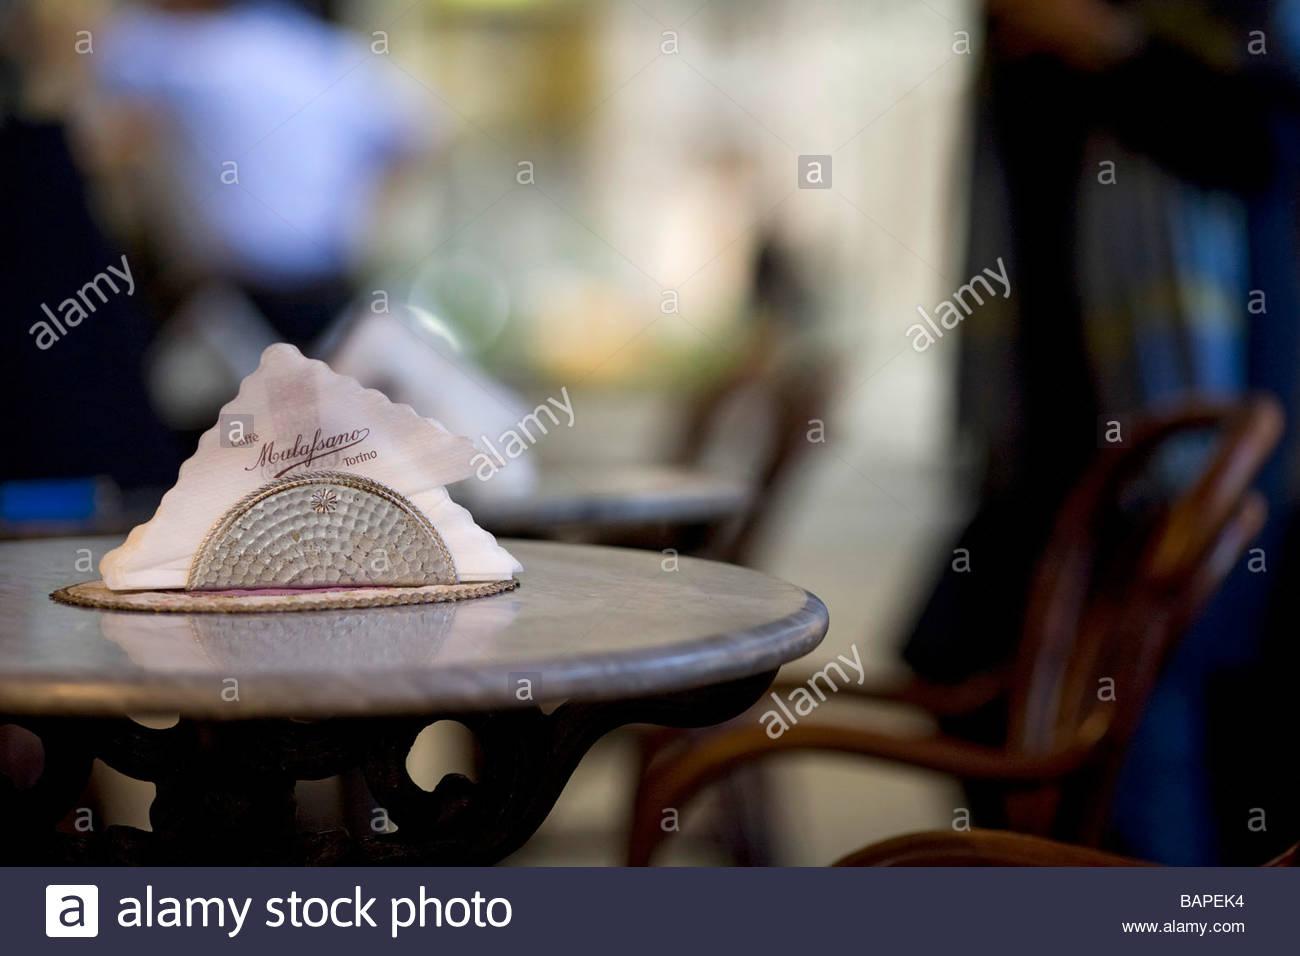 caff mulassano  turin  italy - Stock Image